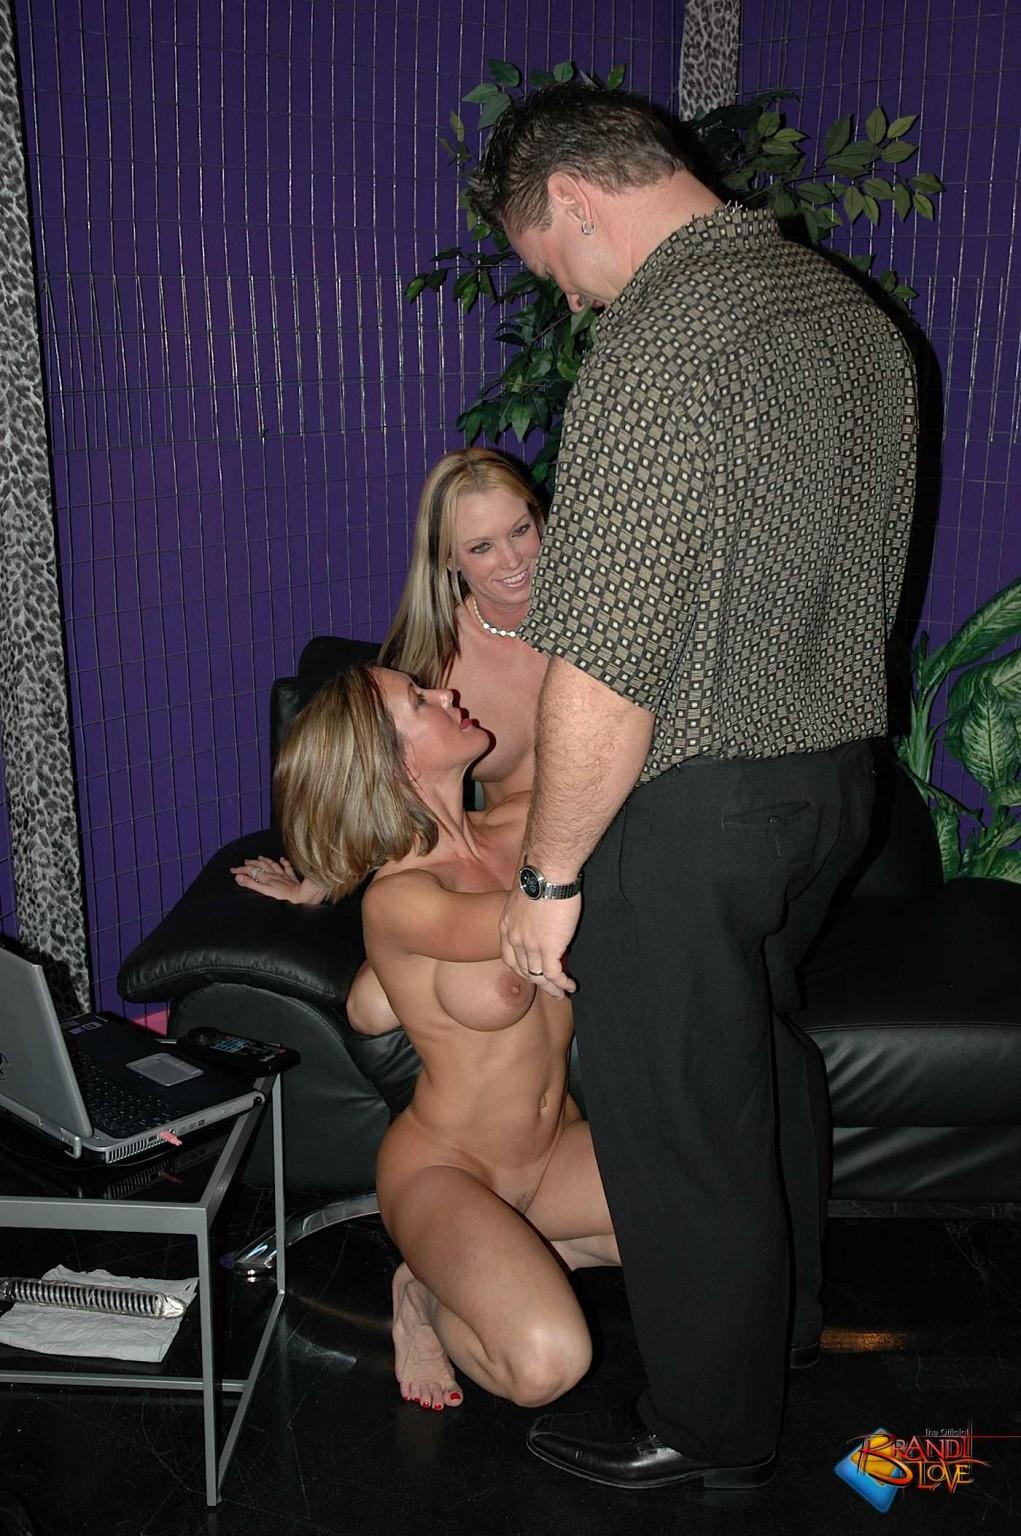 Aj applegate interracial anal